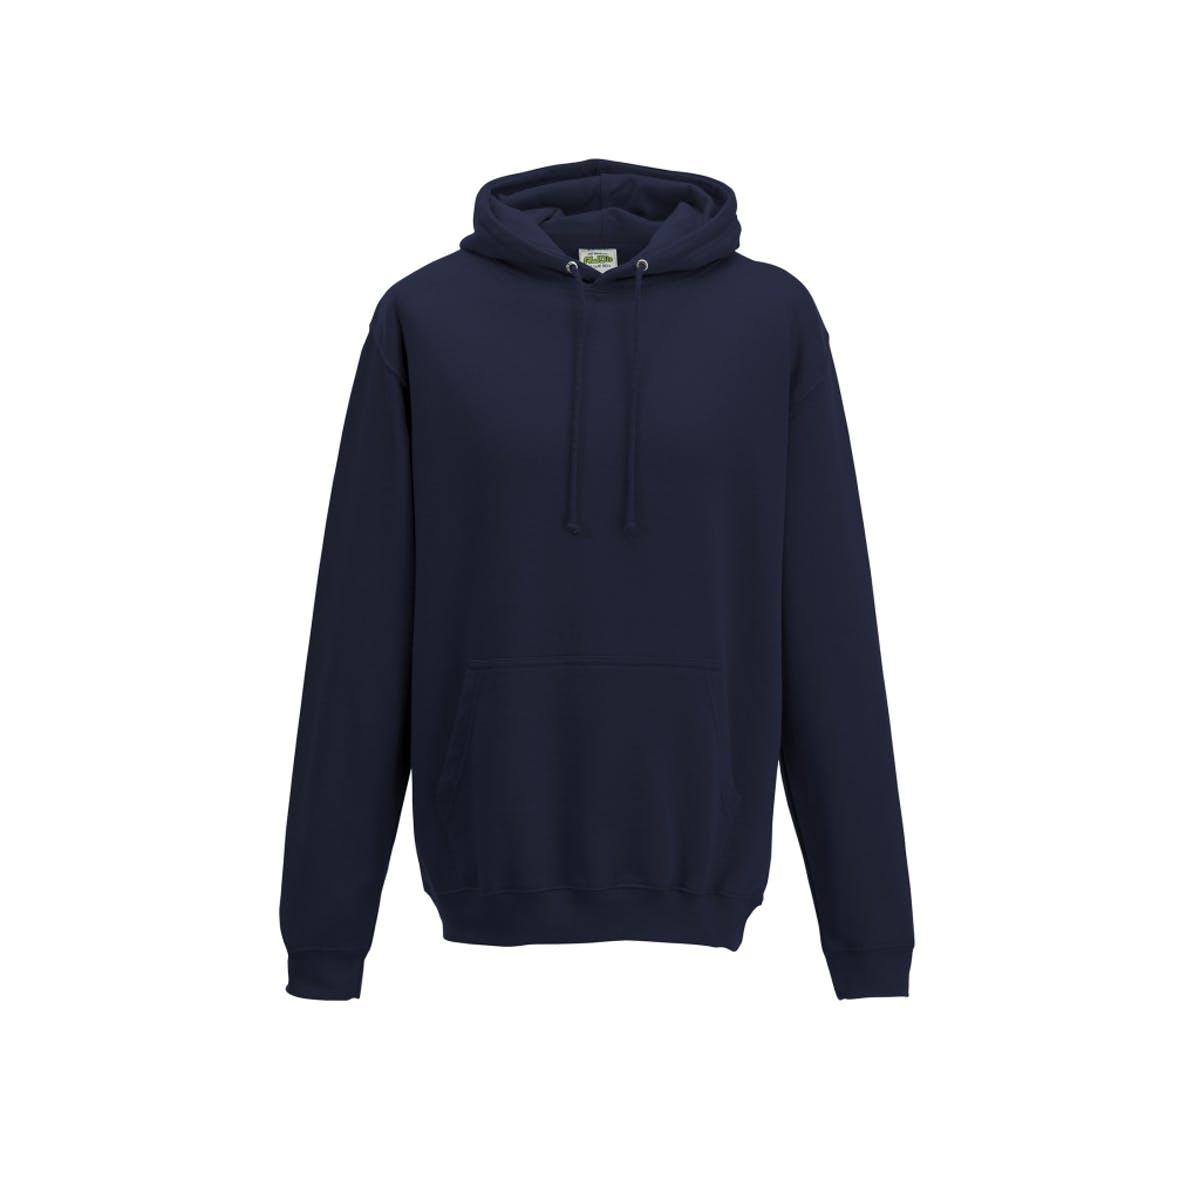 denim blue college hoodies